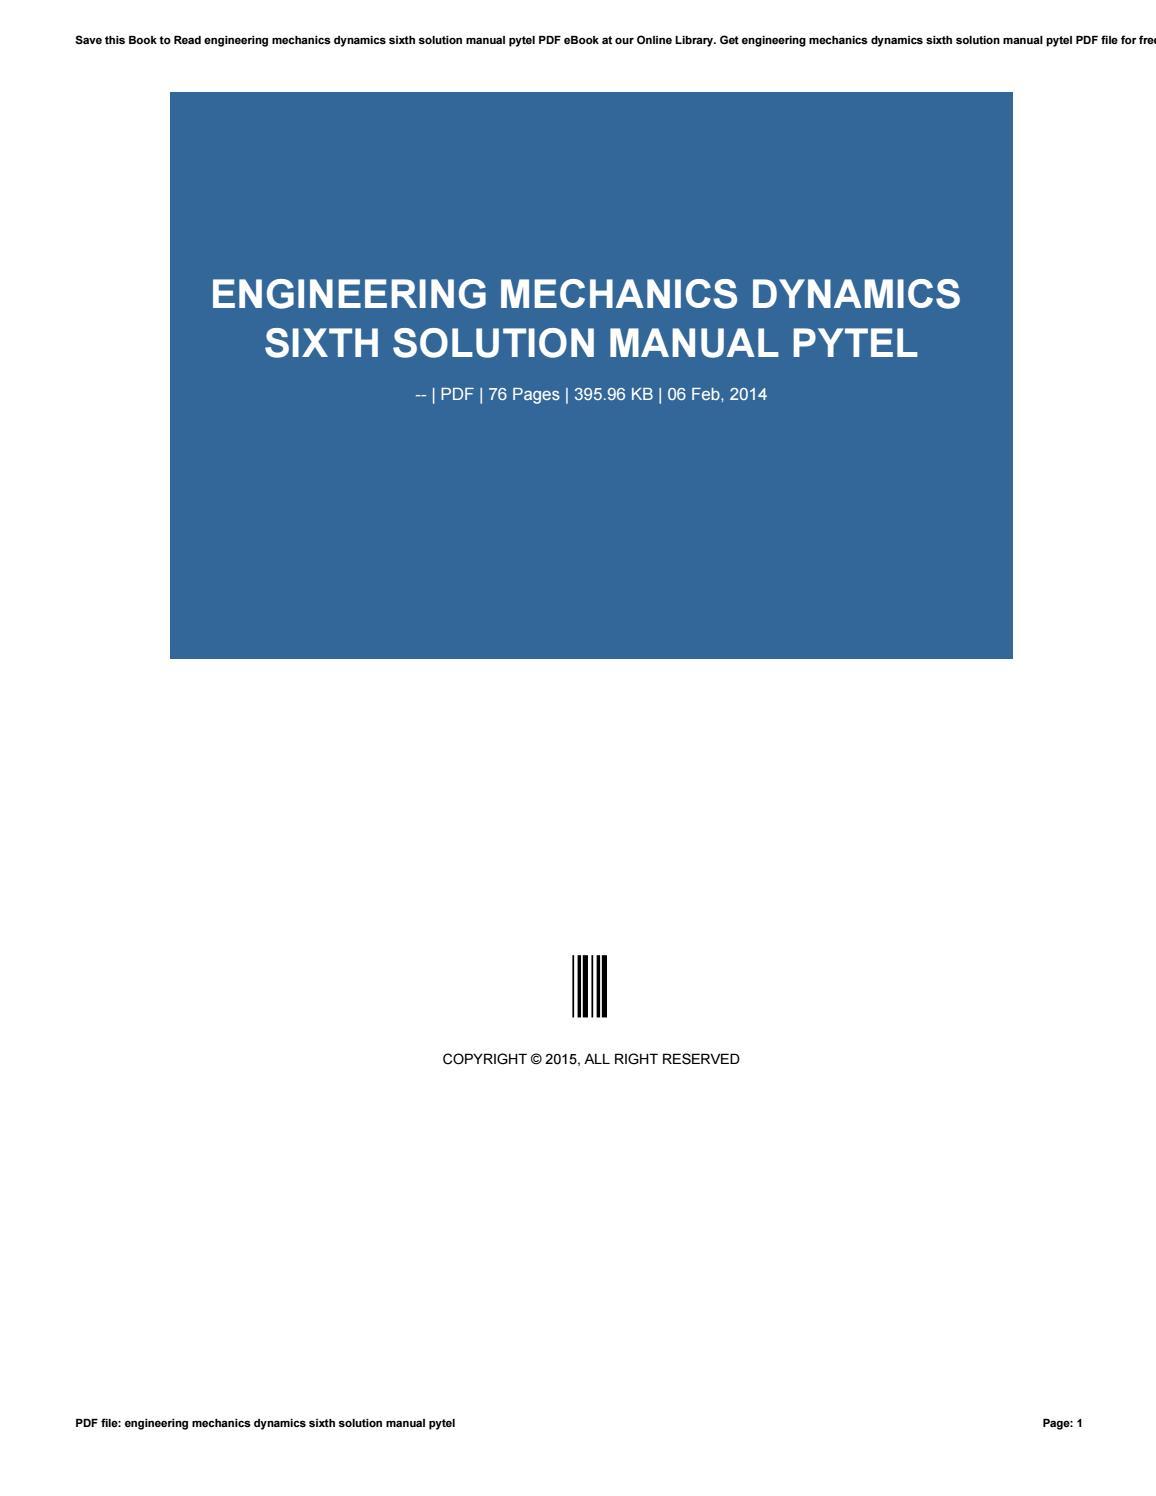 Engineering mechanics dynamics sixth solution manual pytel by minex-coin814  - issuu